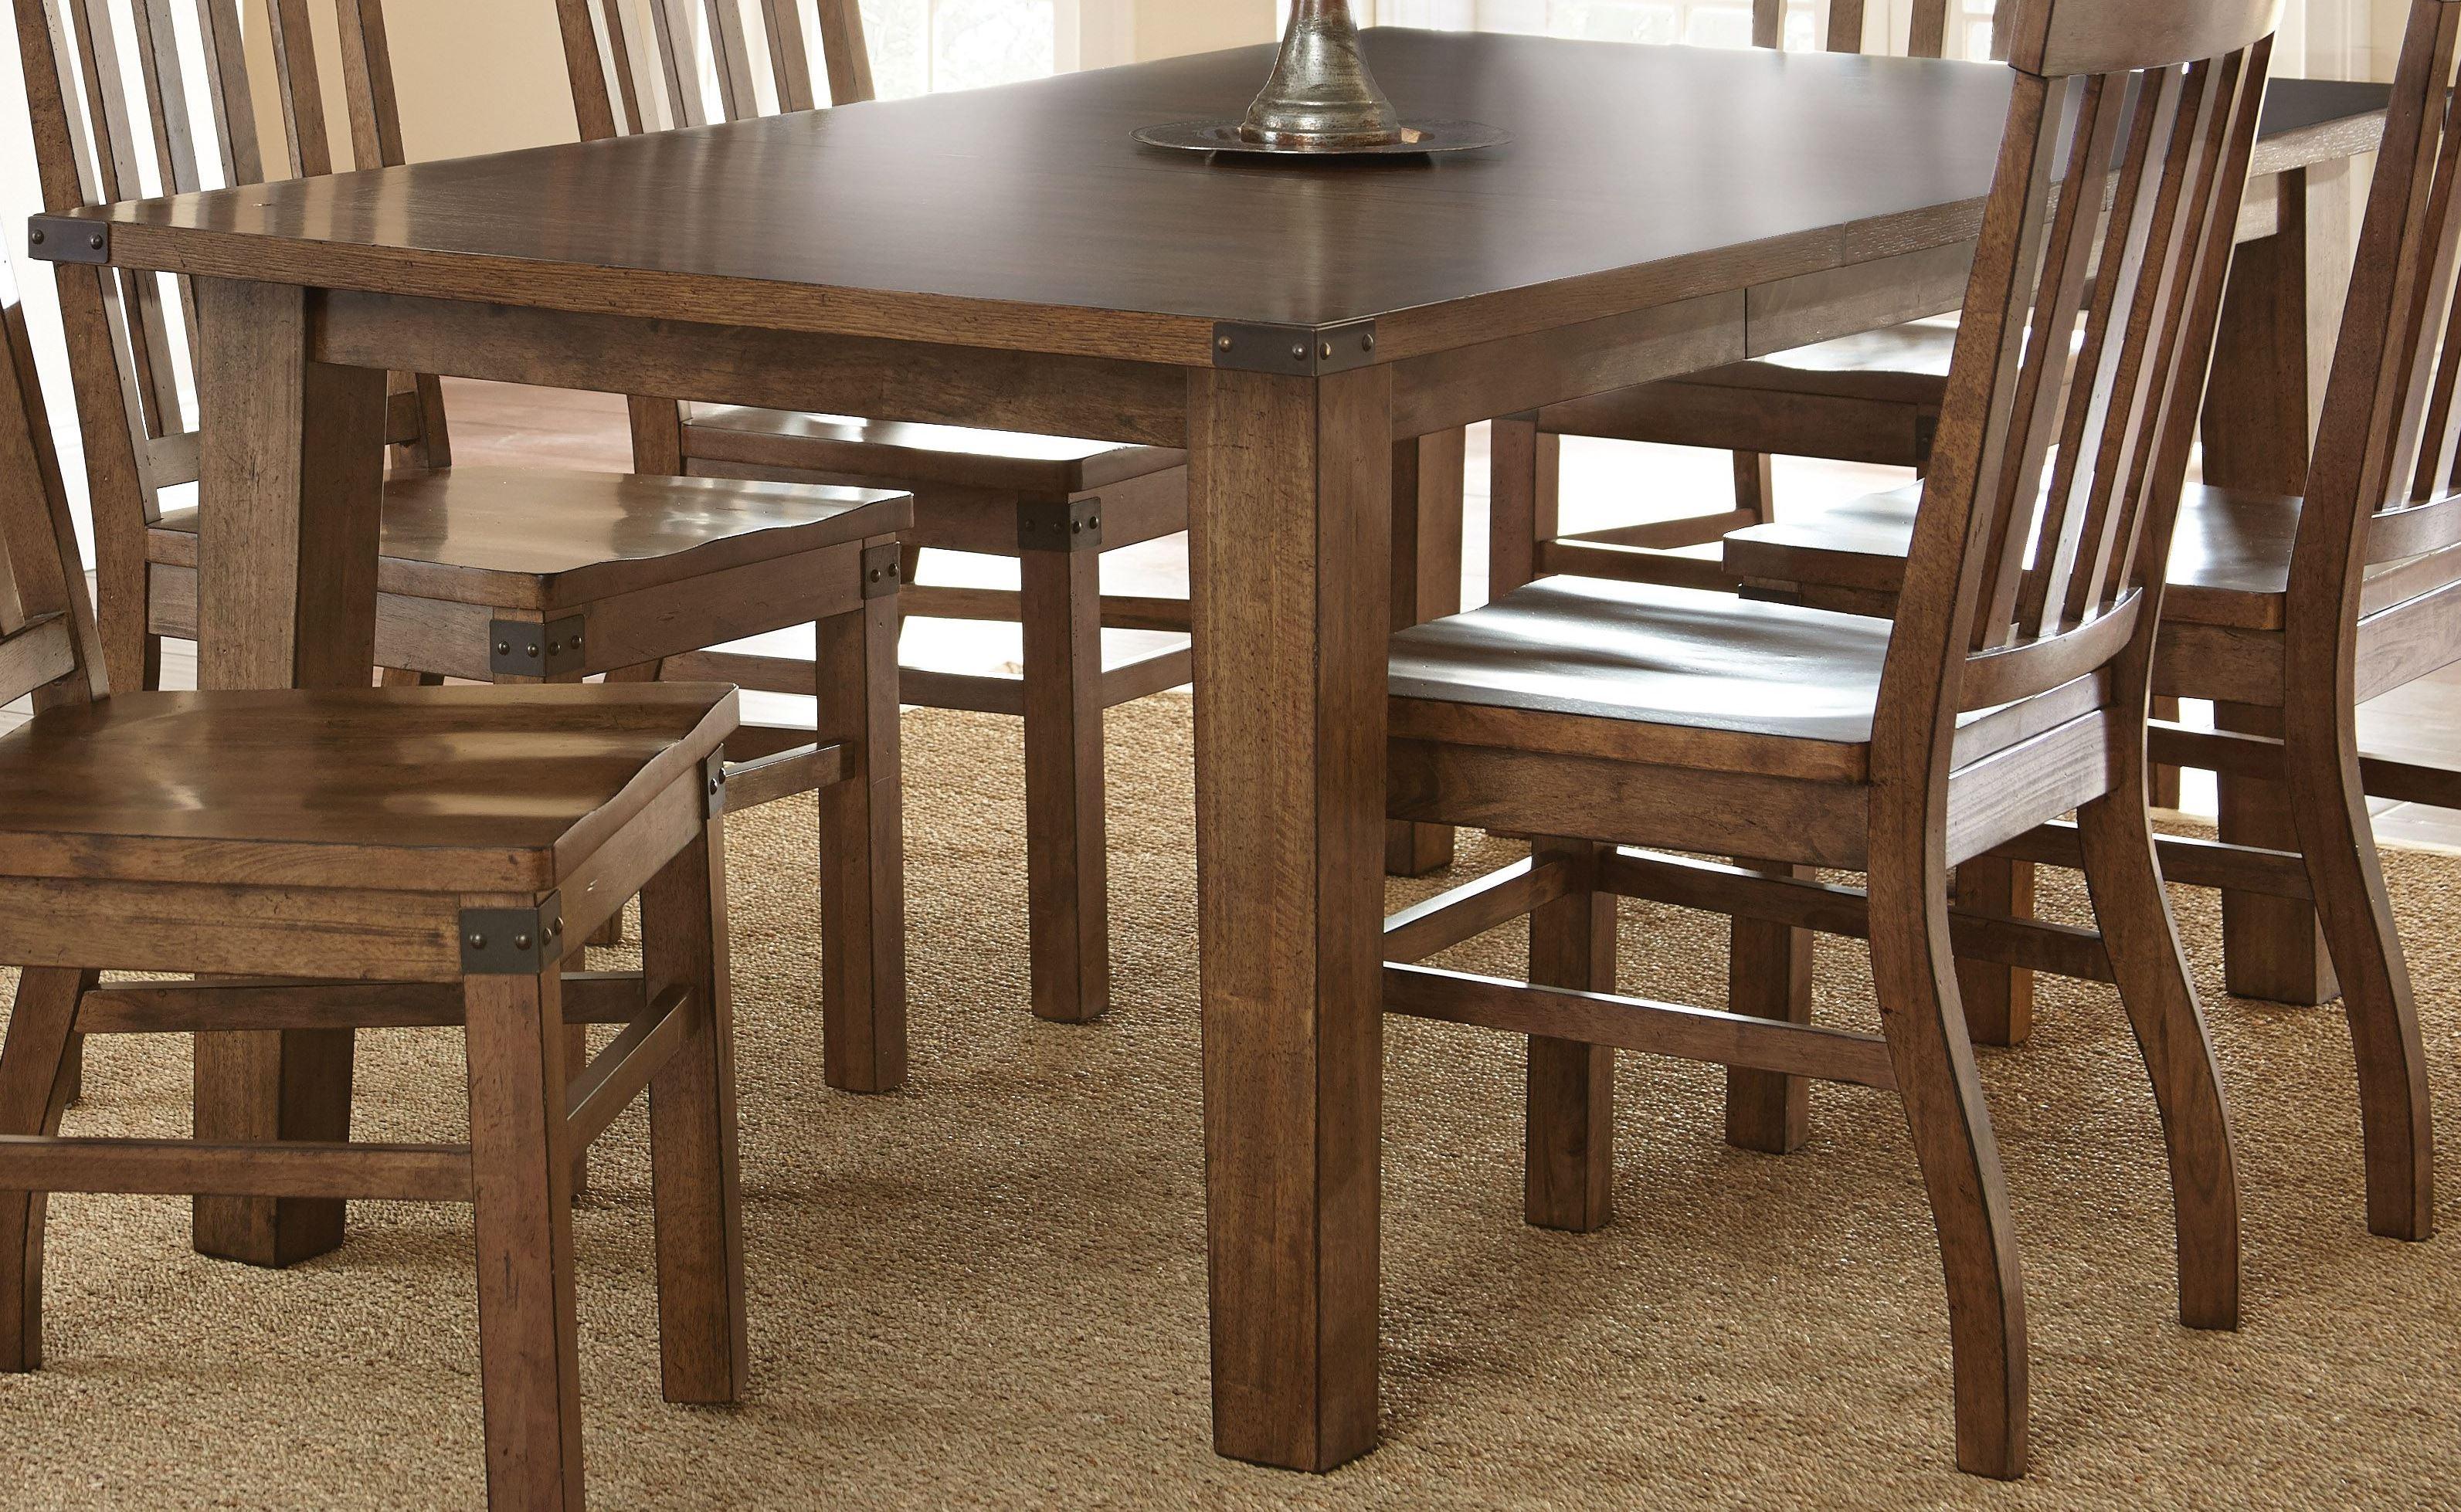 hailee antique oak extendable rectangular dining table from steve silver ha500t coleman. Black Bedroom Furniture Sets. Home Design Ideas